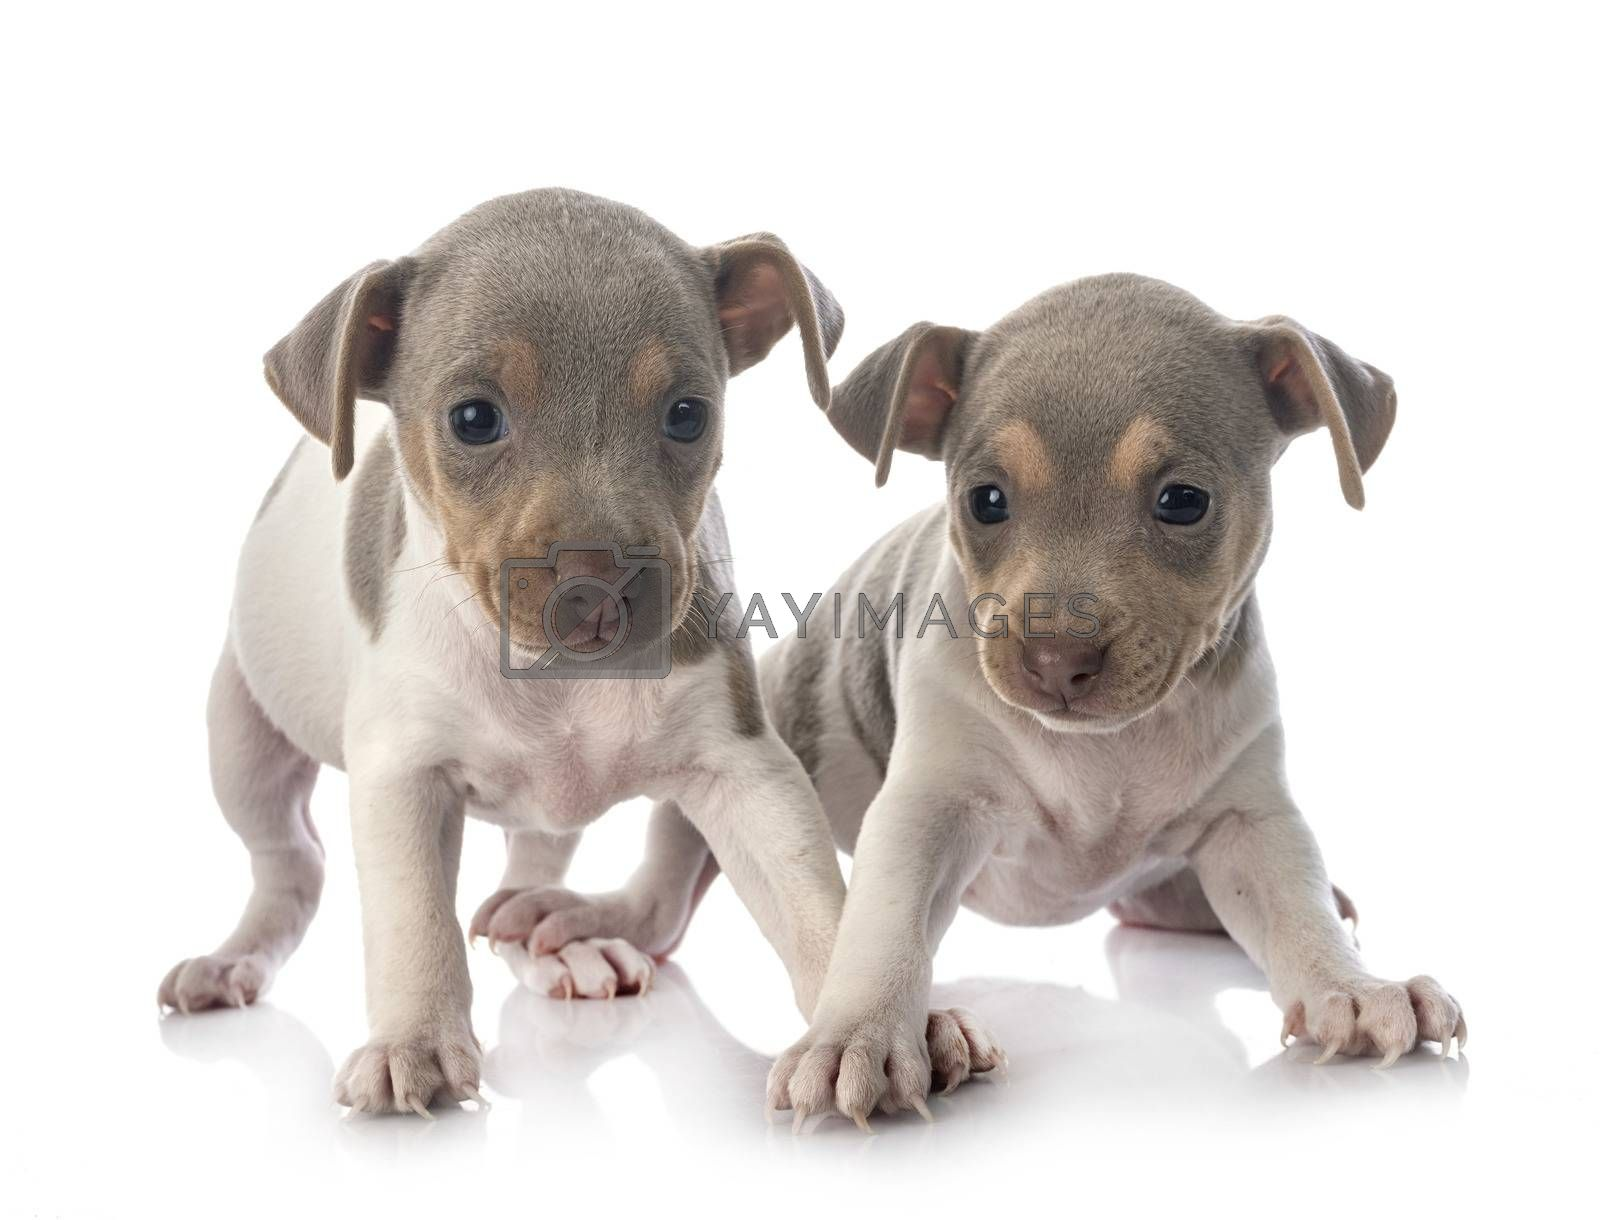 puppies brazilian terrier in studio by cynoclub